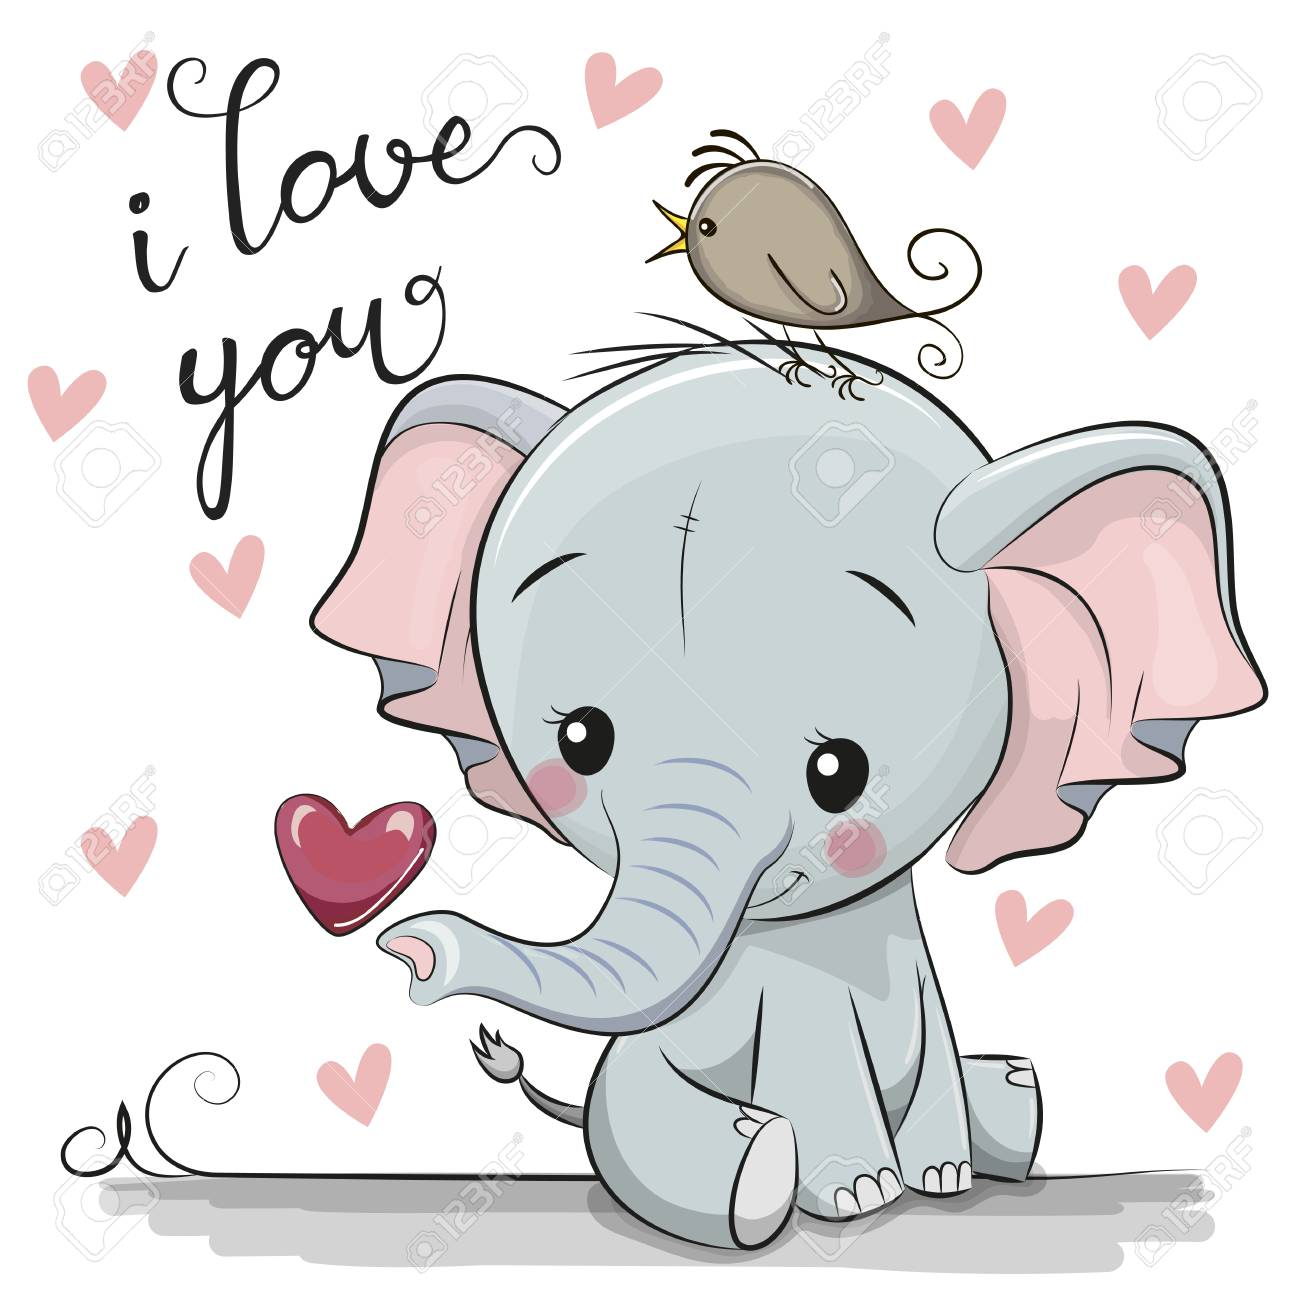 Cute Cartoon Elephant with Heart on a white background - 118130366